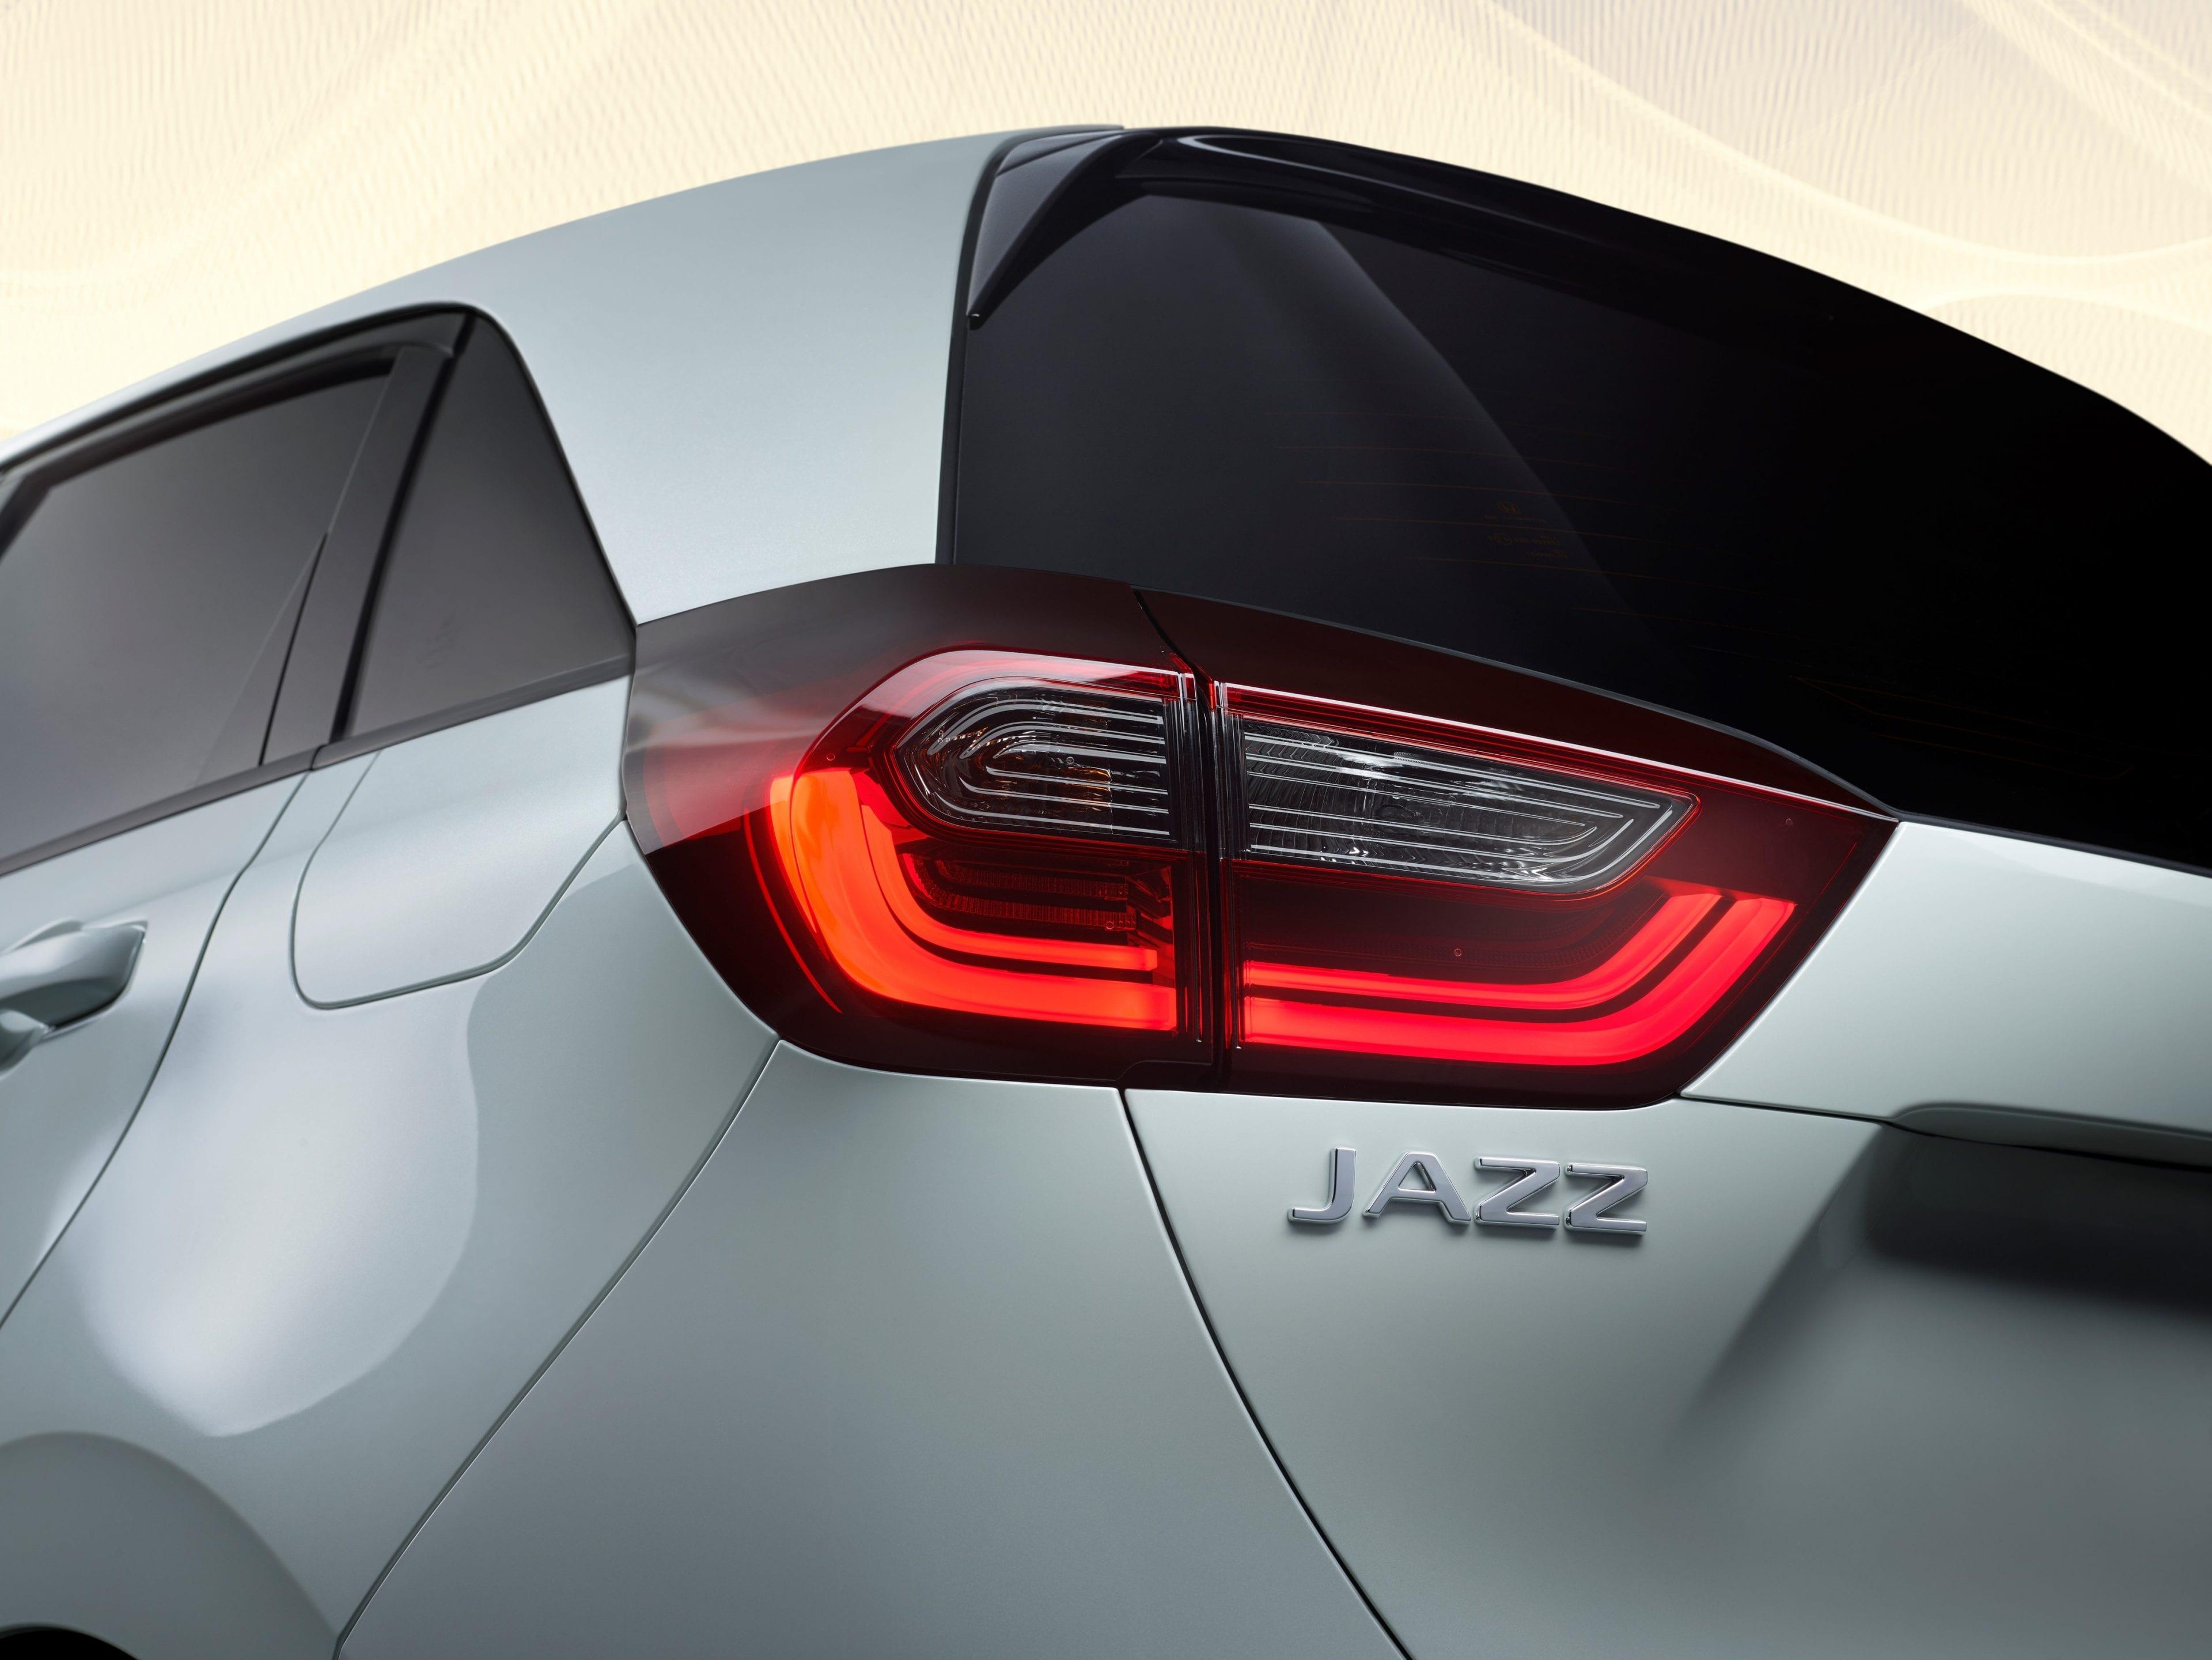 Honda Jazz details